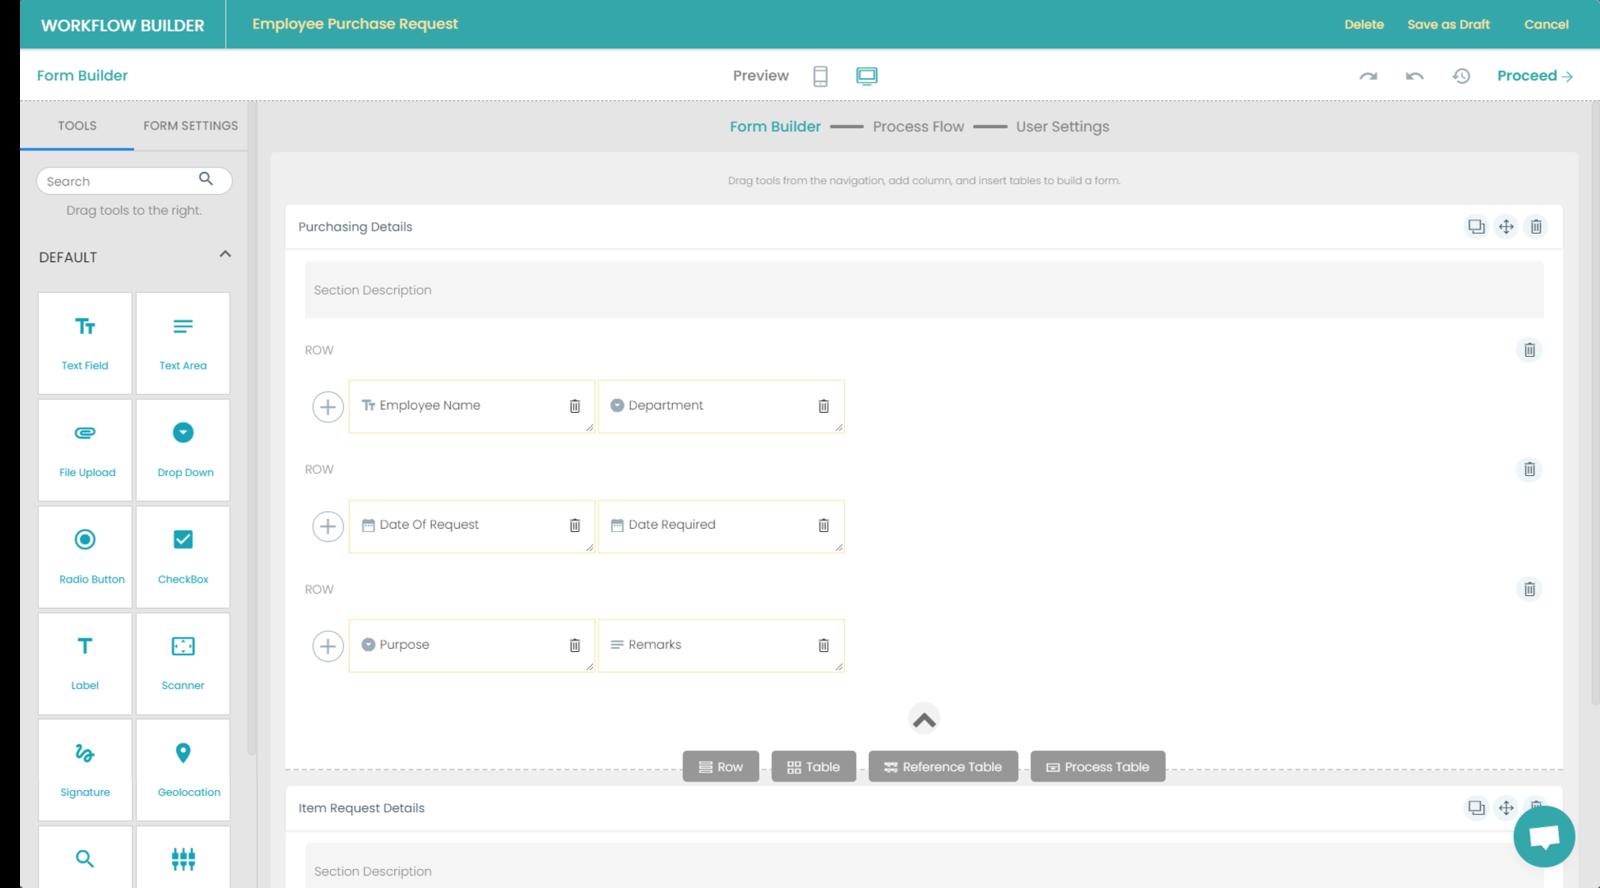 Fig. 3: Requisition Management Form Builder preview